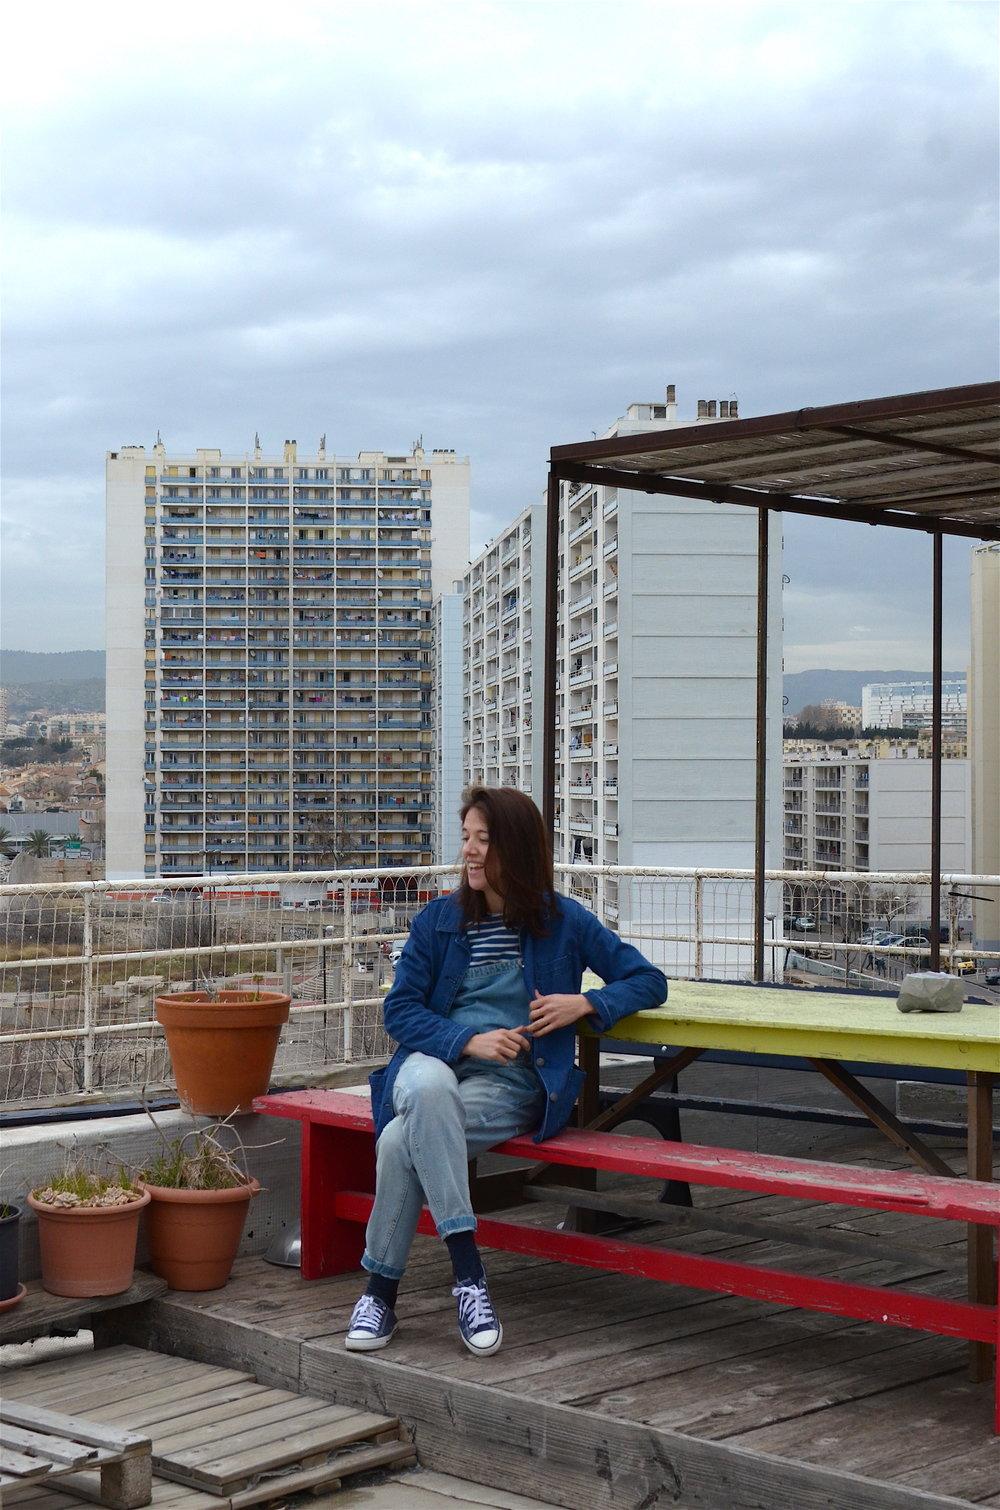 twinky lizzy blog aix en provence - maison maison 01.jpg